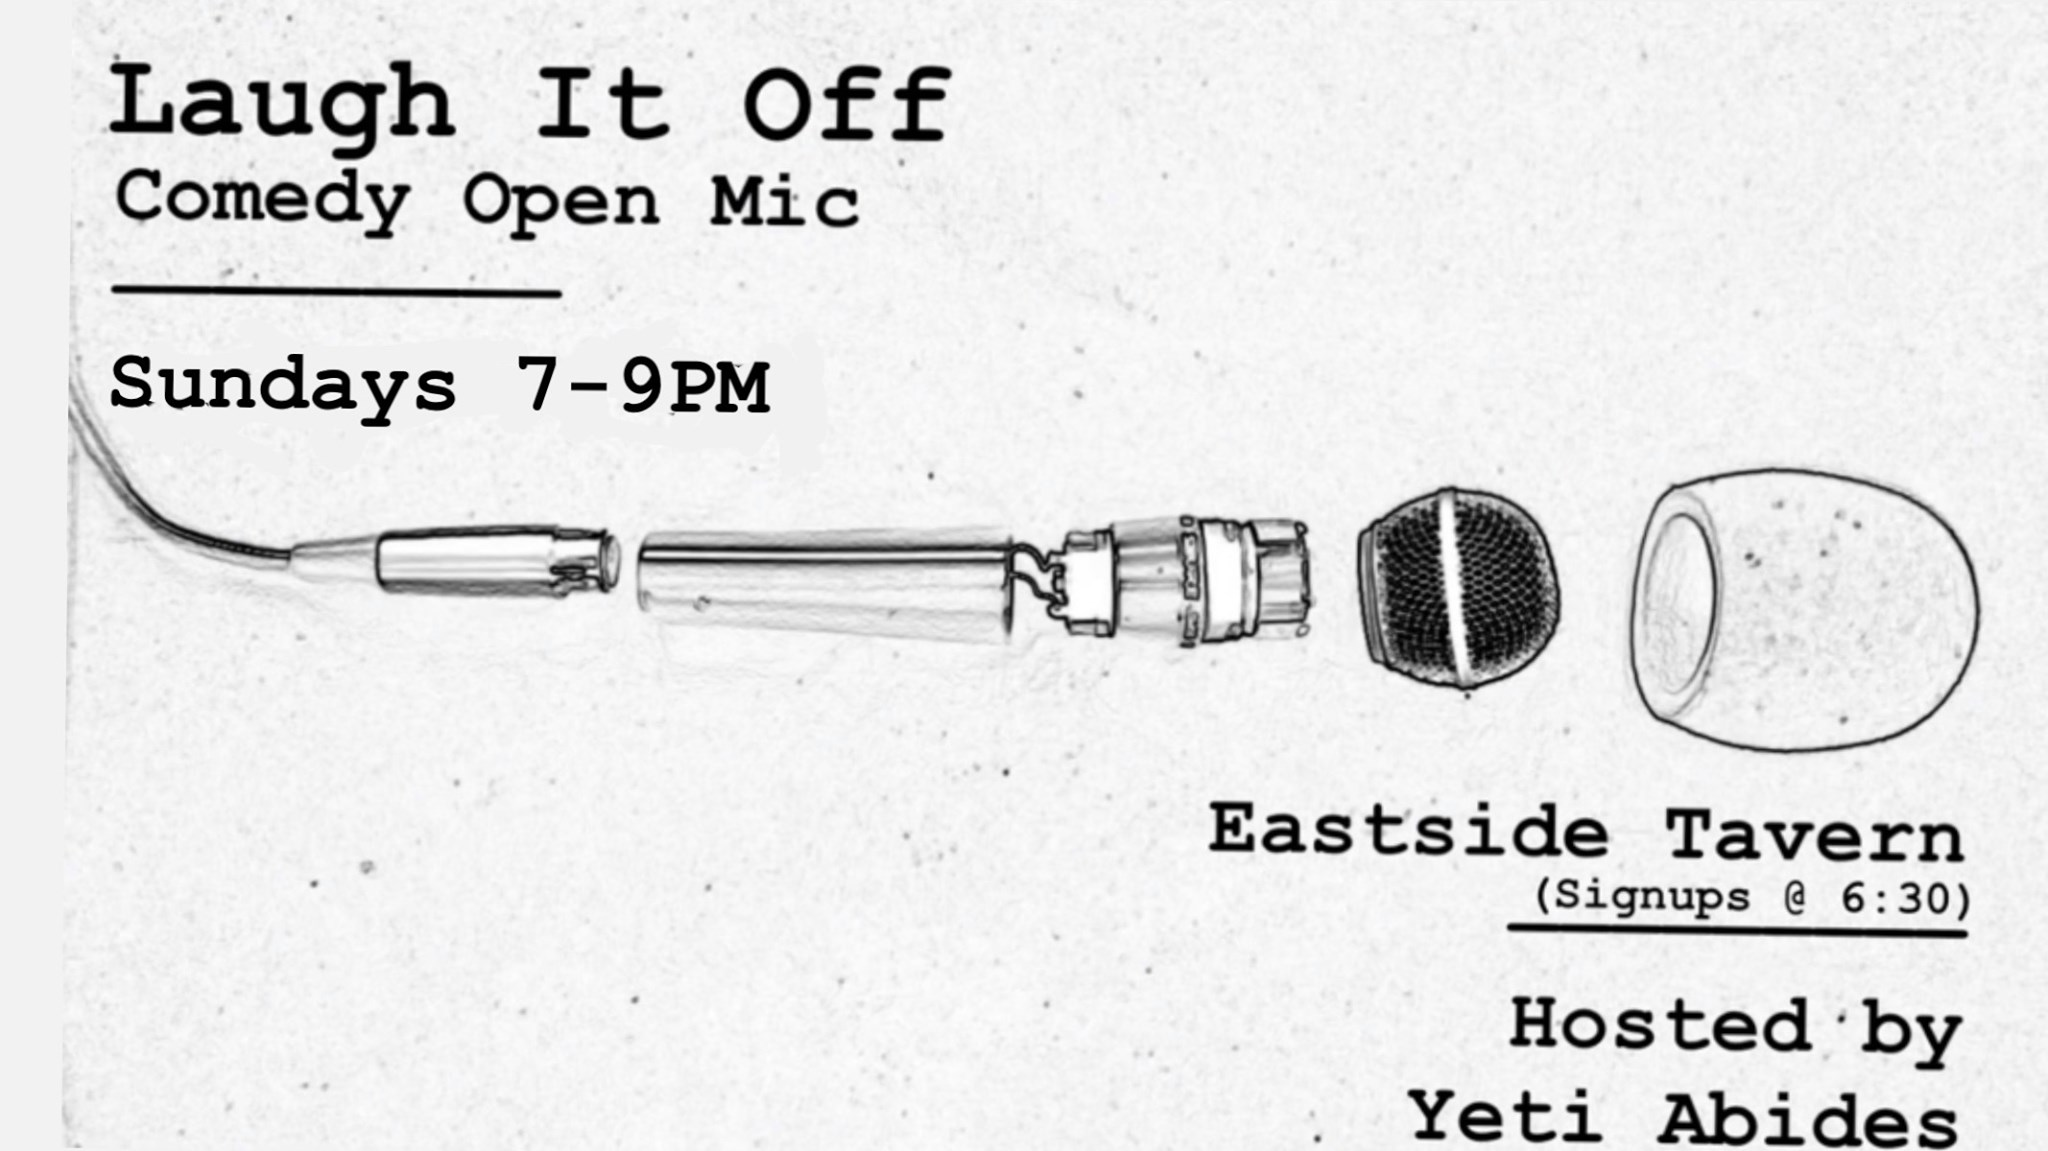 comedy open mic